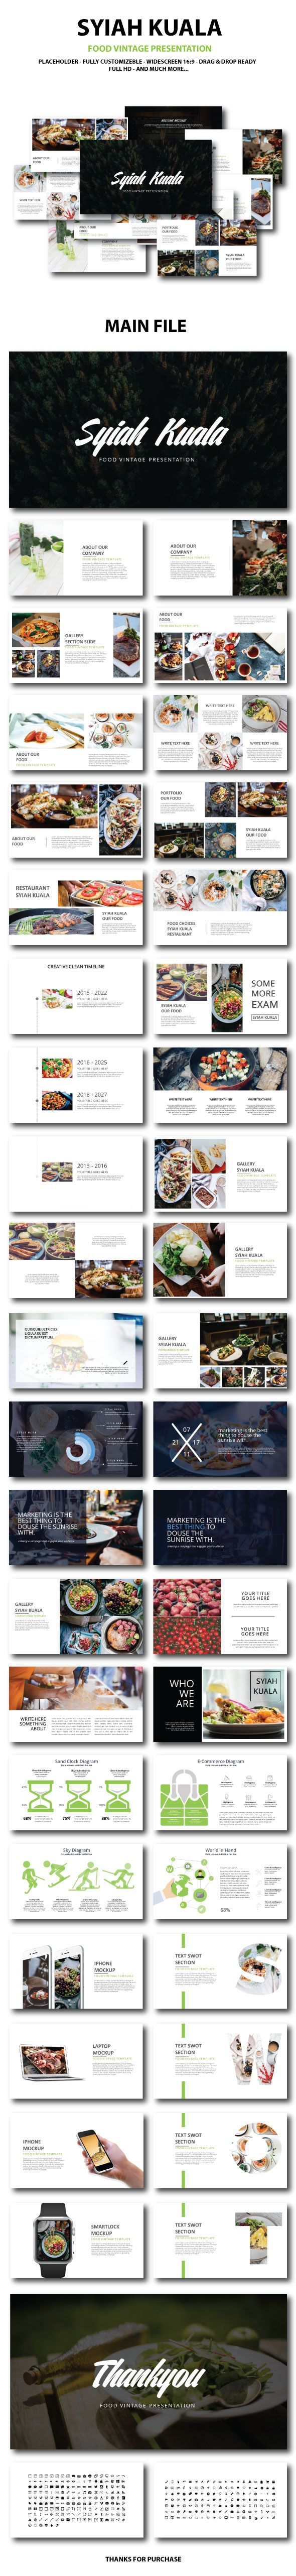 Syiah Kuala - PowerPoint Presentation Template